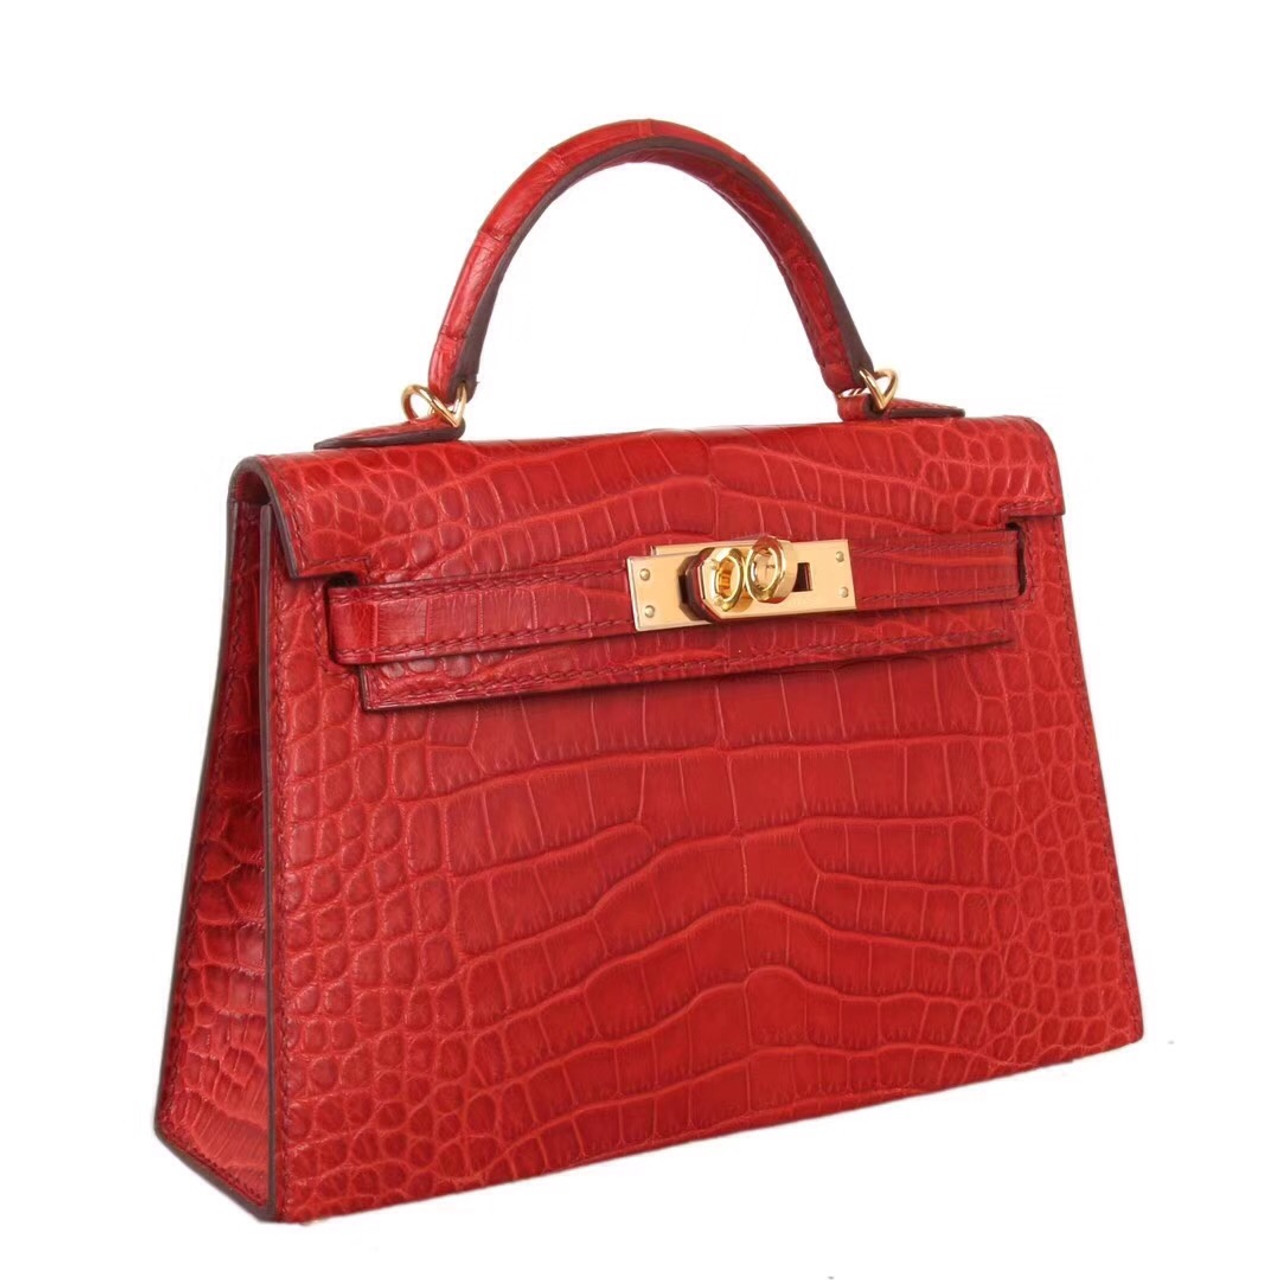 351e683a8412 Hermès Mini Kelly D5 Géranuim Crocodile Bag Gold Hardware - Bella ...